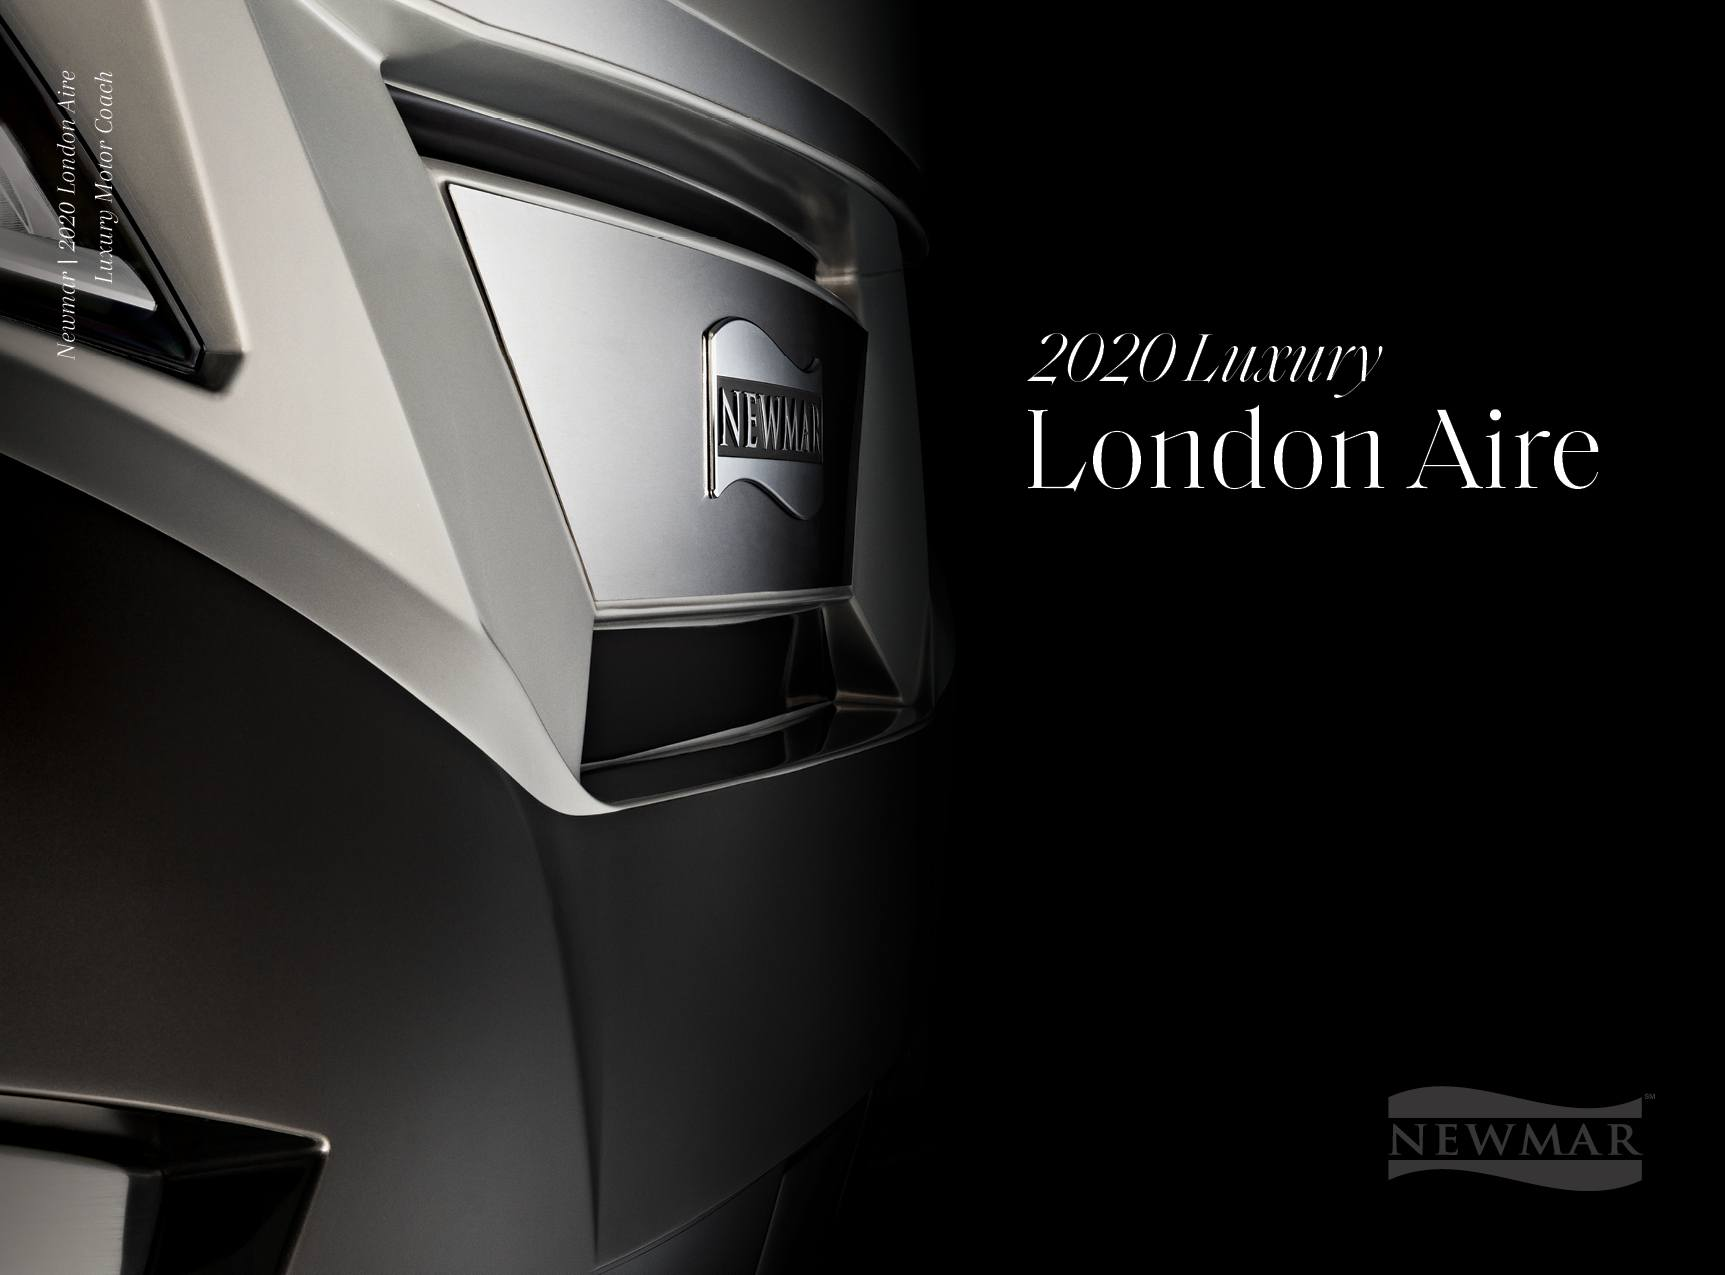 2020 London Aire